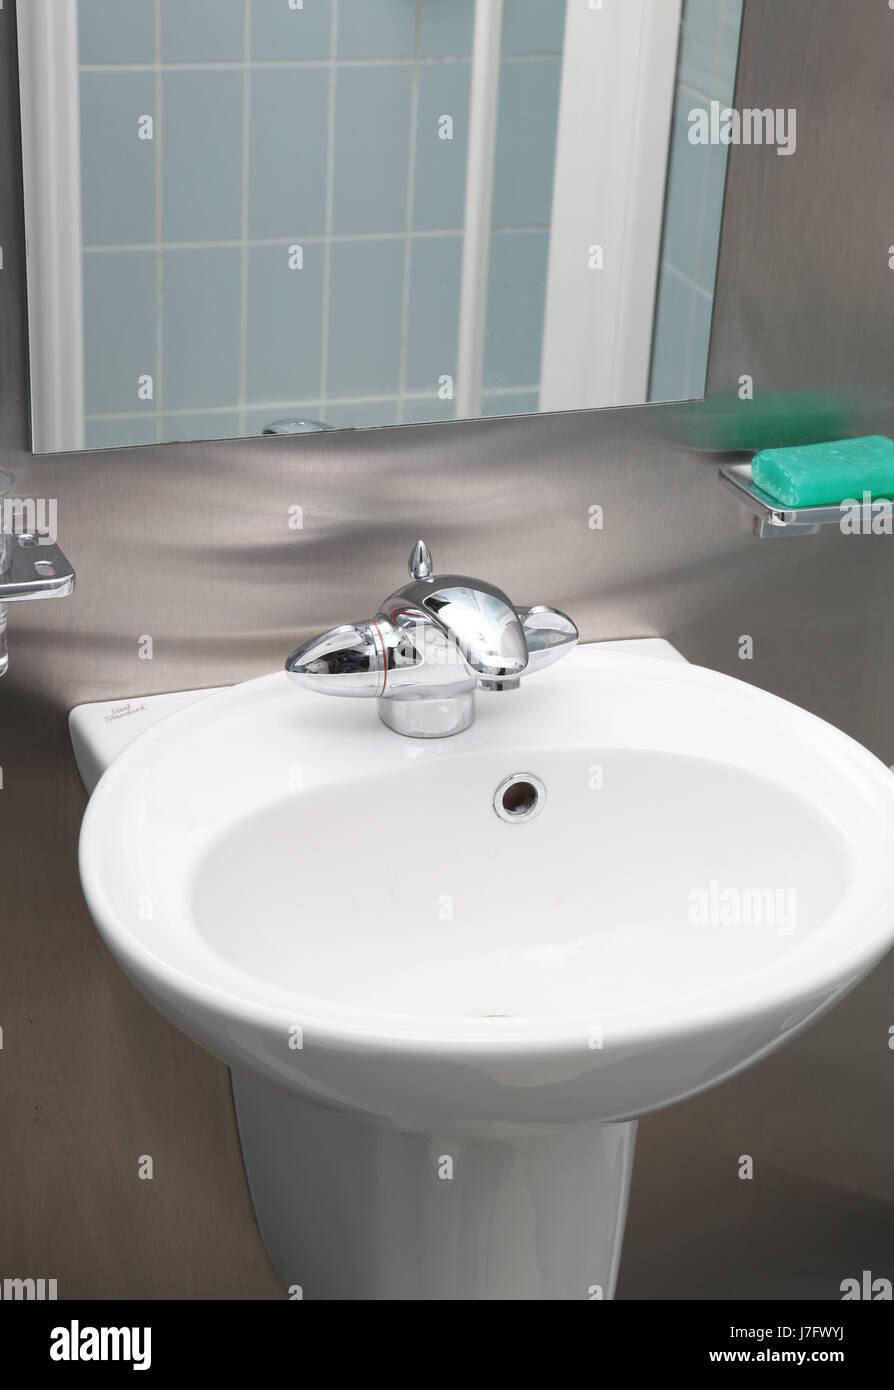 Inneren Waschbecken Einheit Spule Becken Bad Becken Innen Modern